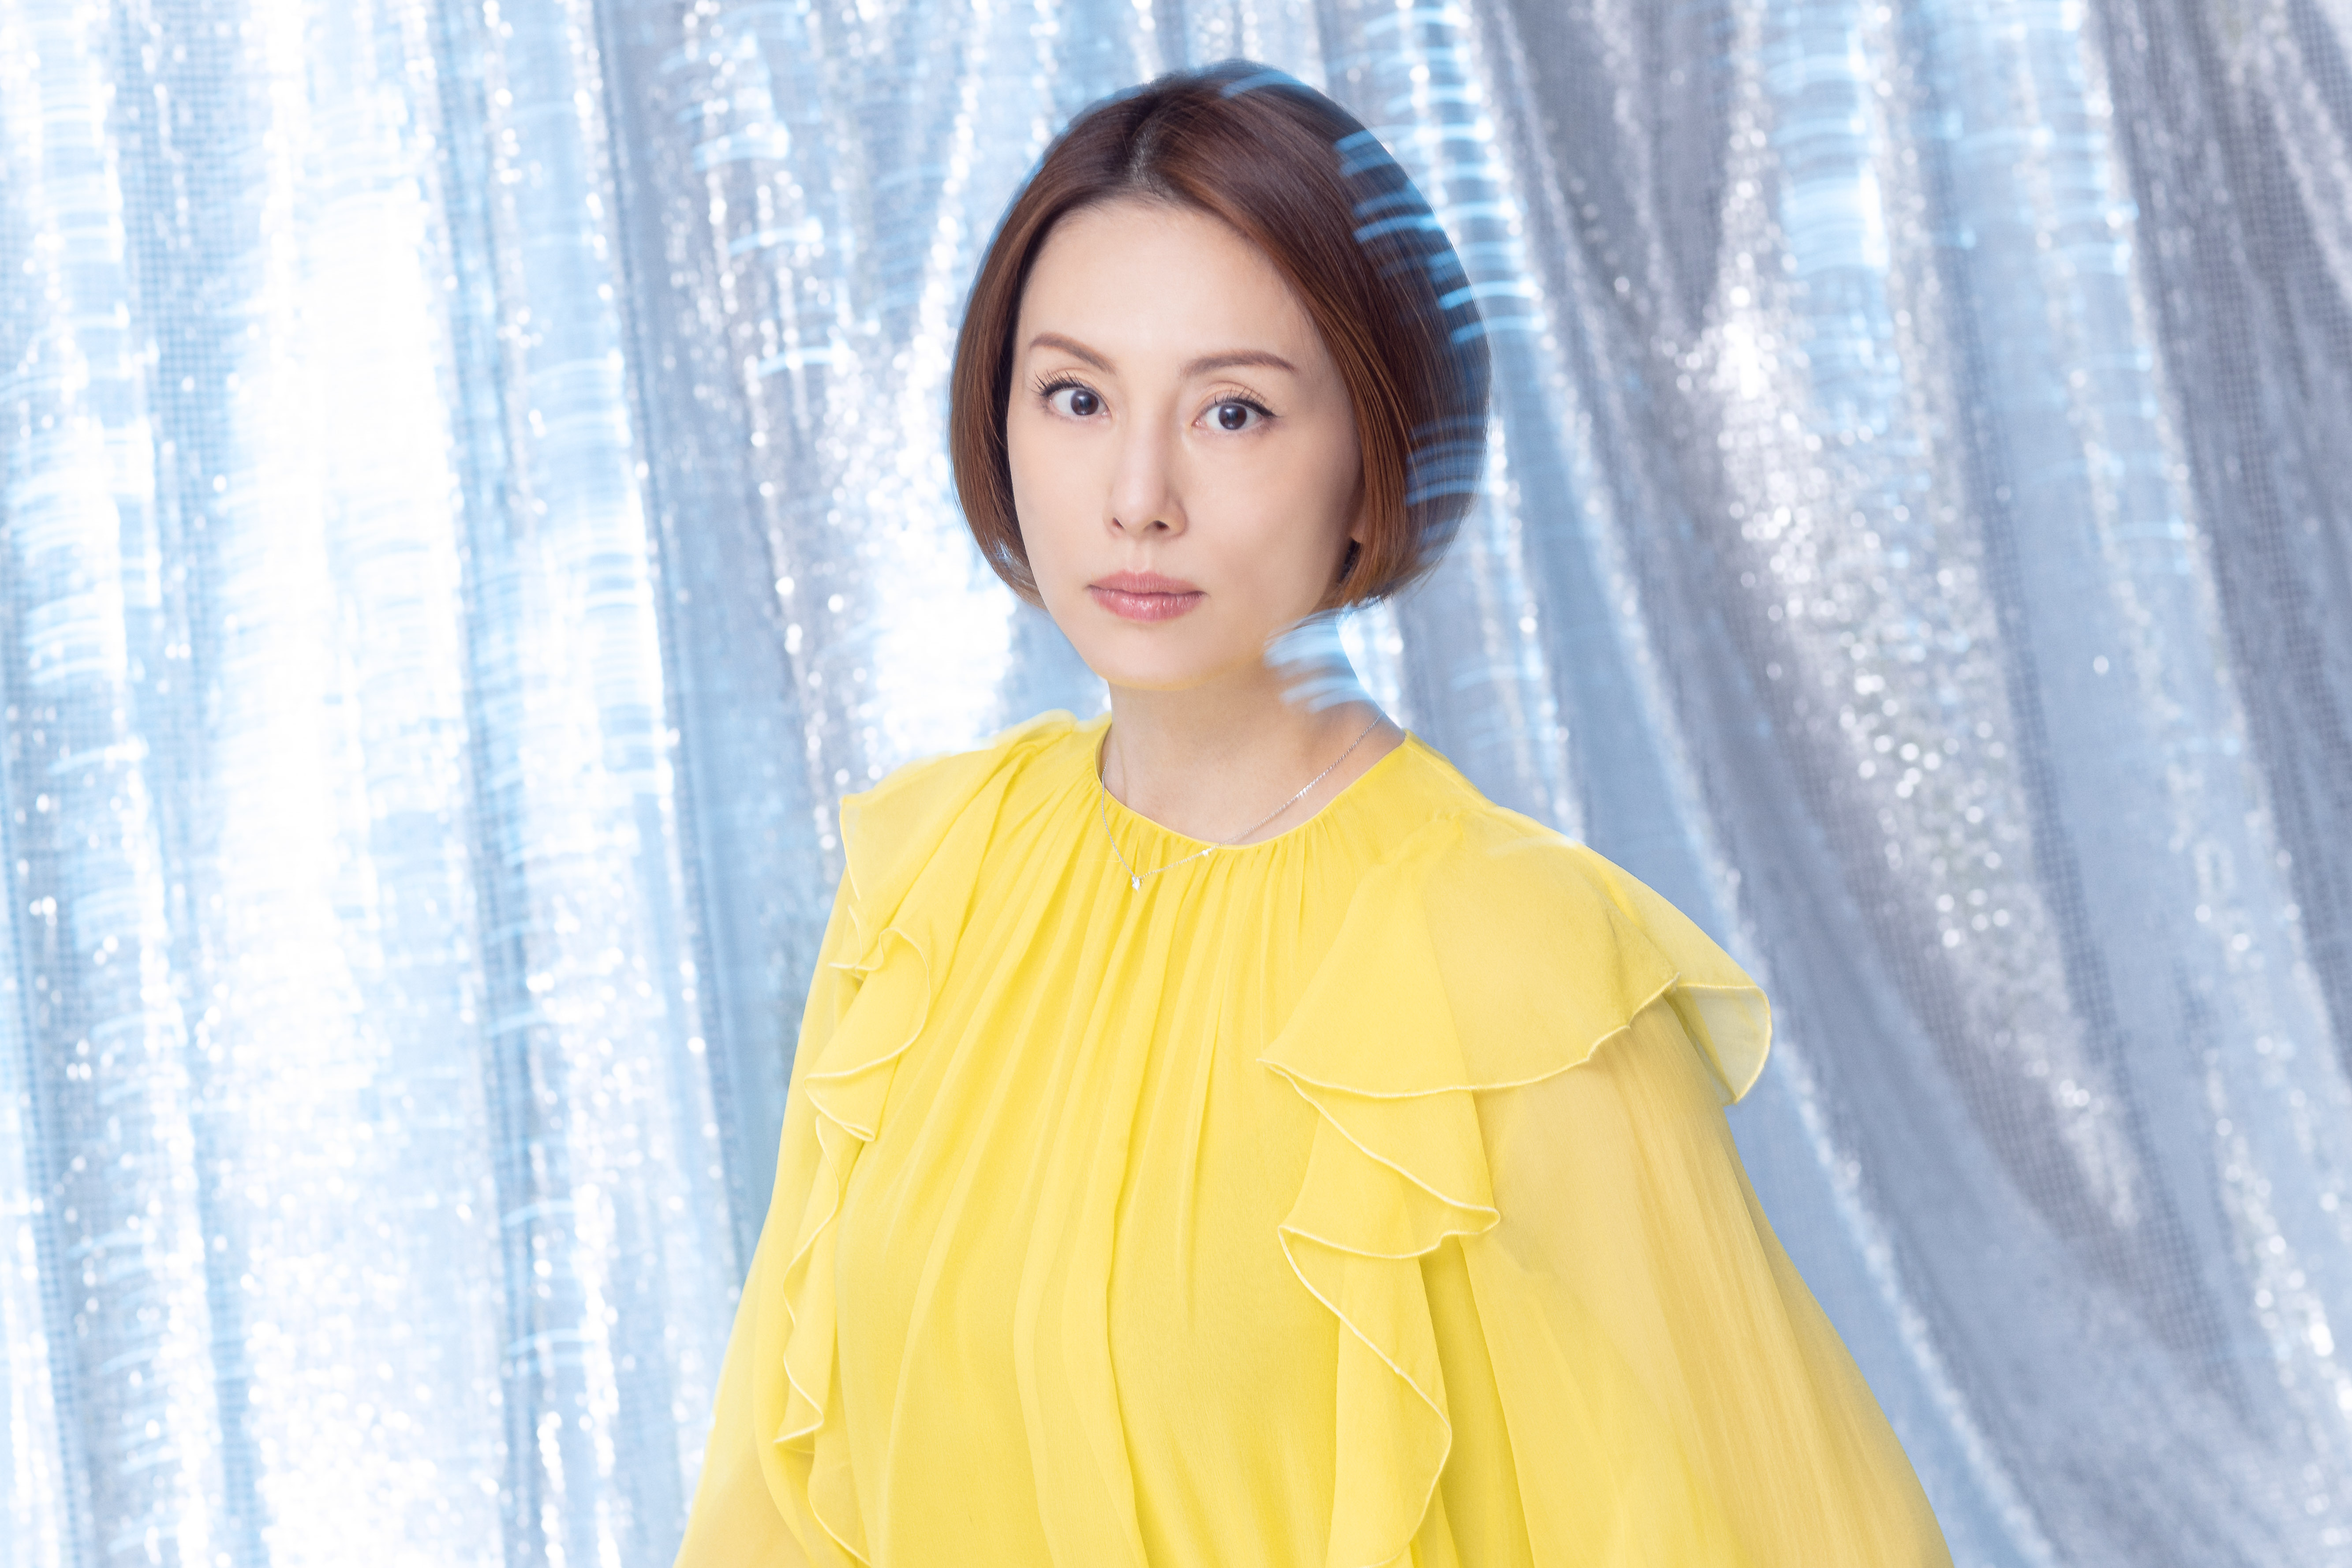 米倉涼子(Forbes Japan)